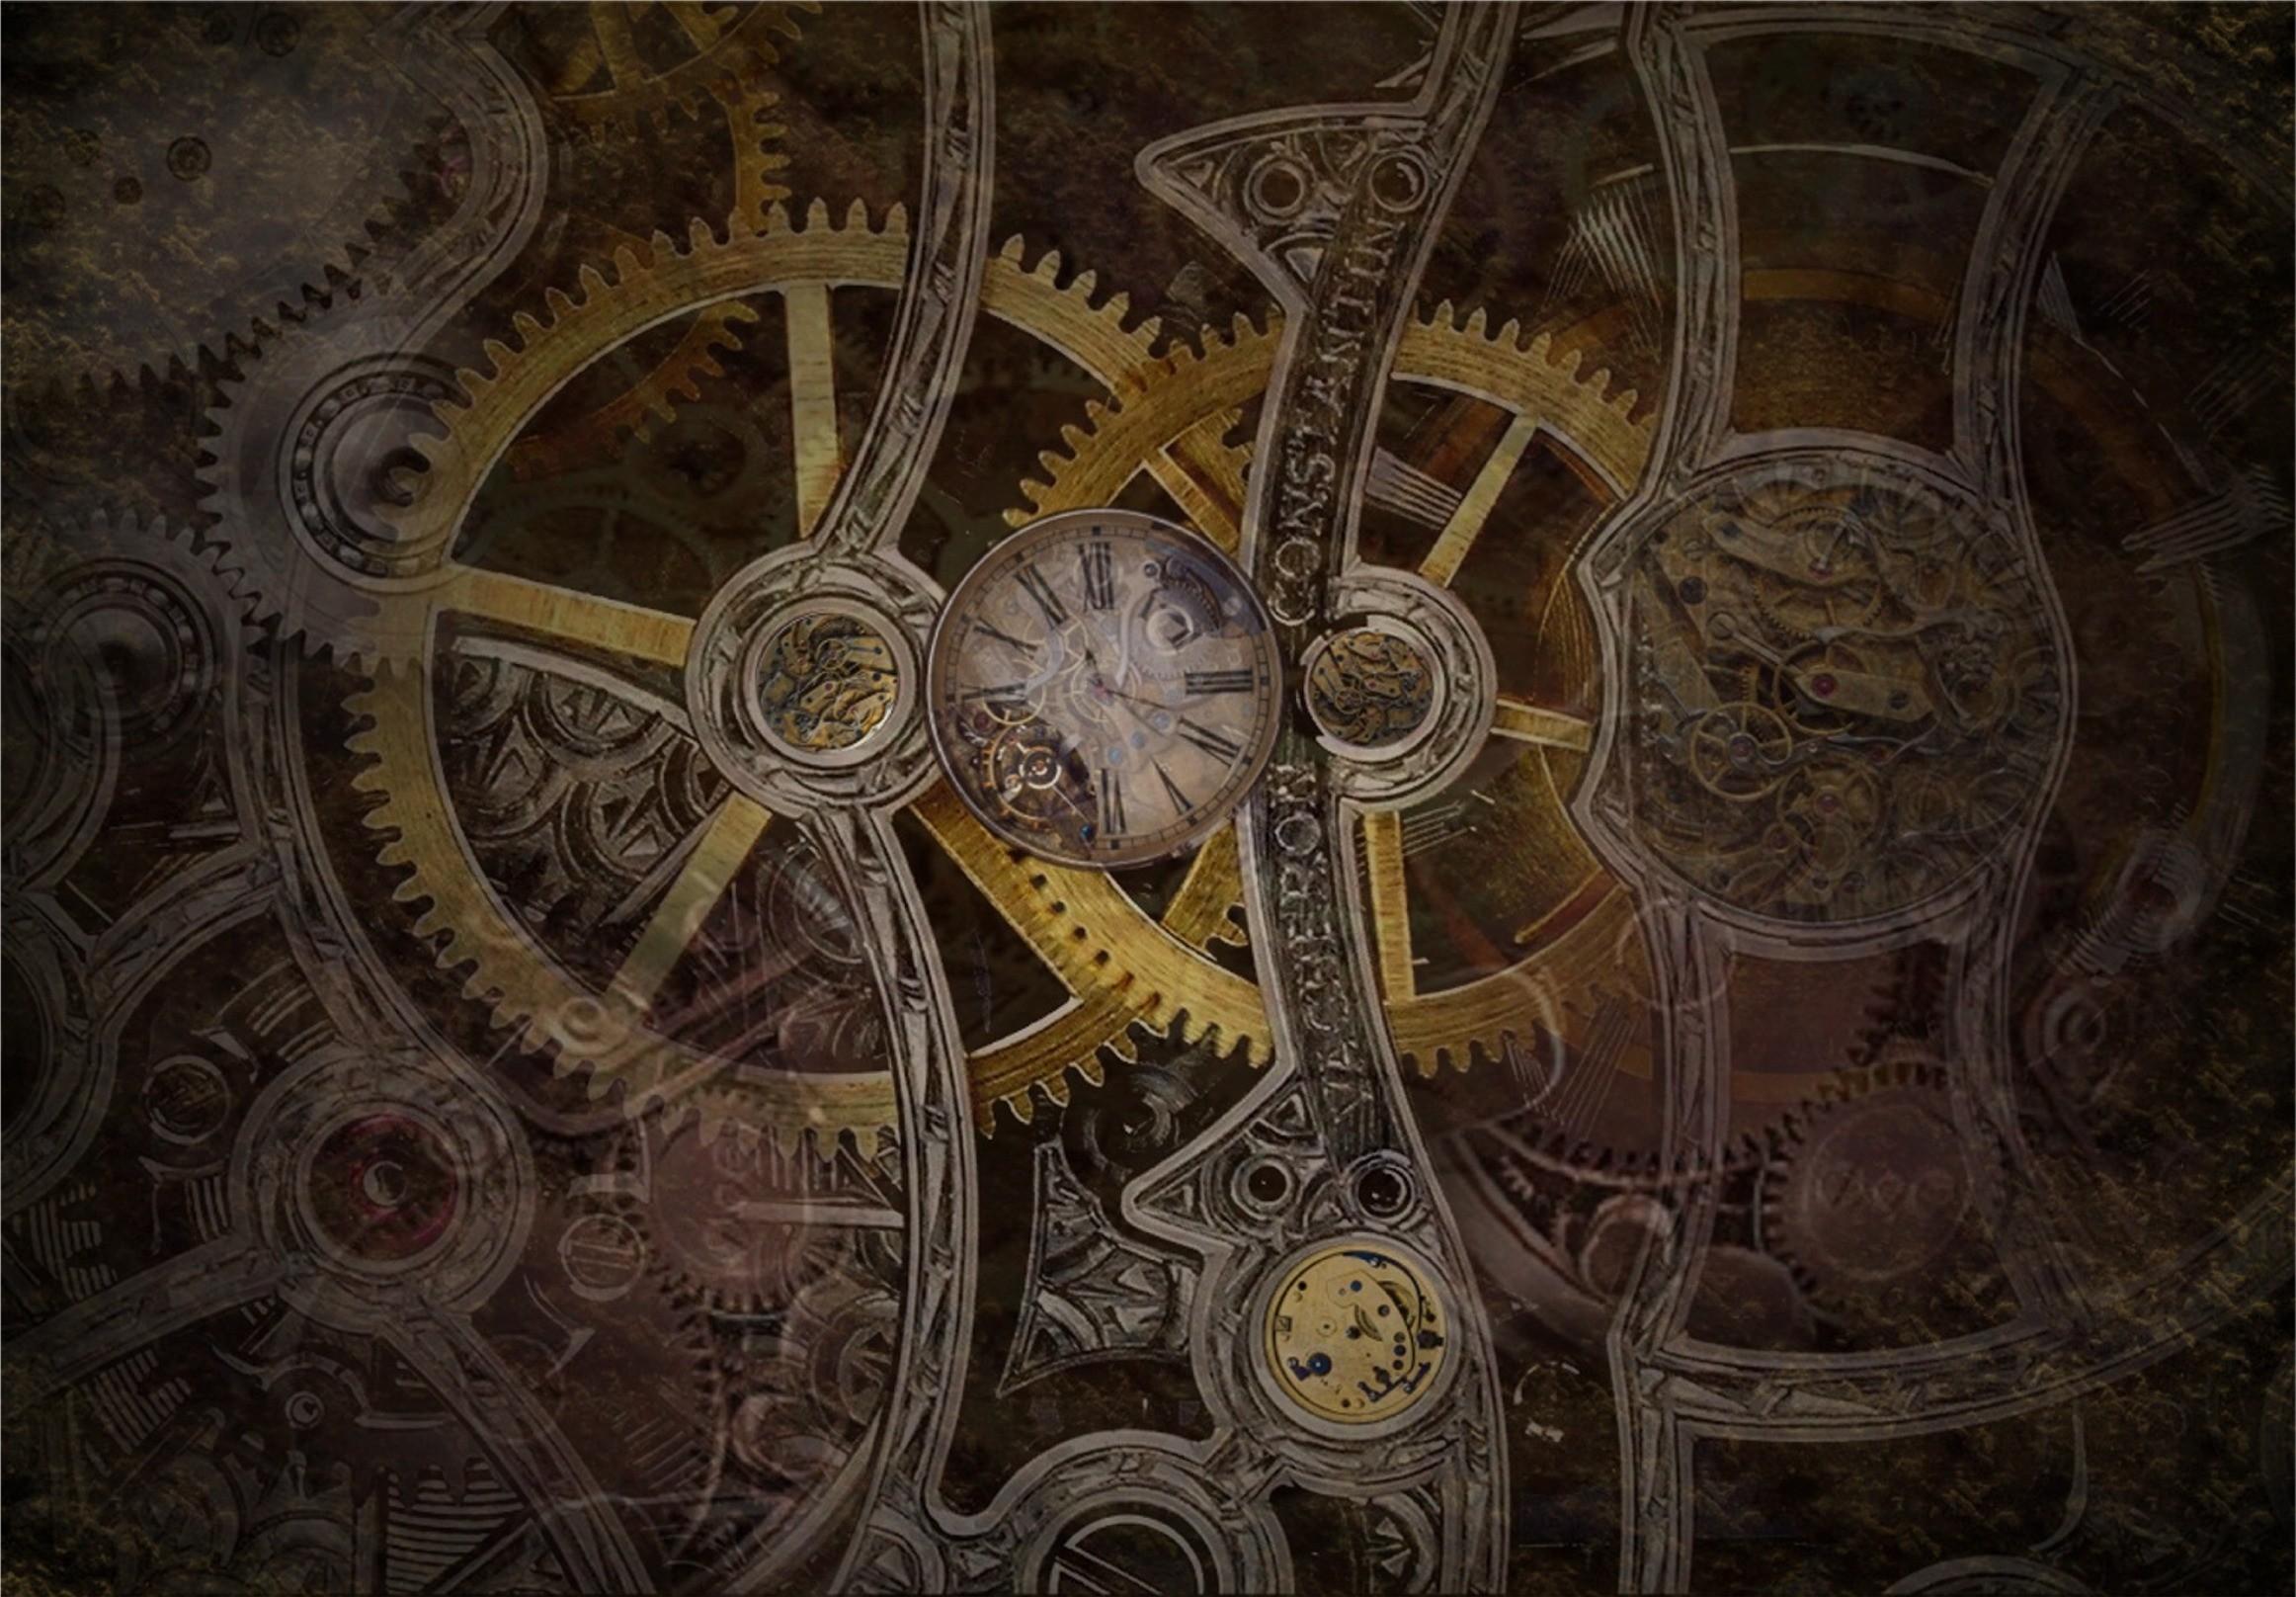 Res: 2324x1616, Sci Fi - Steampunk Gears Wallpaper